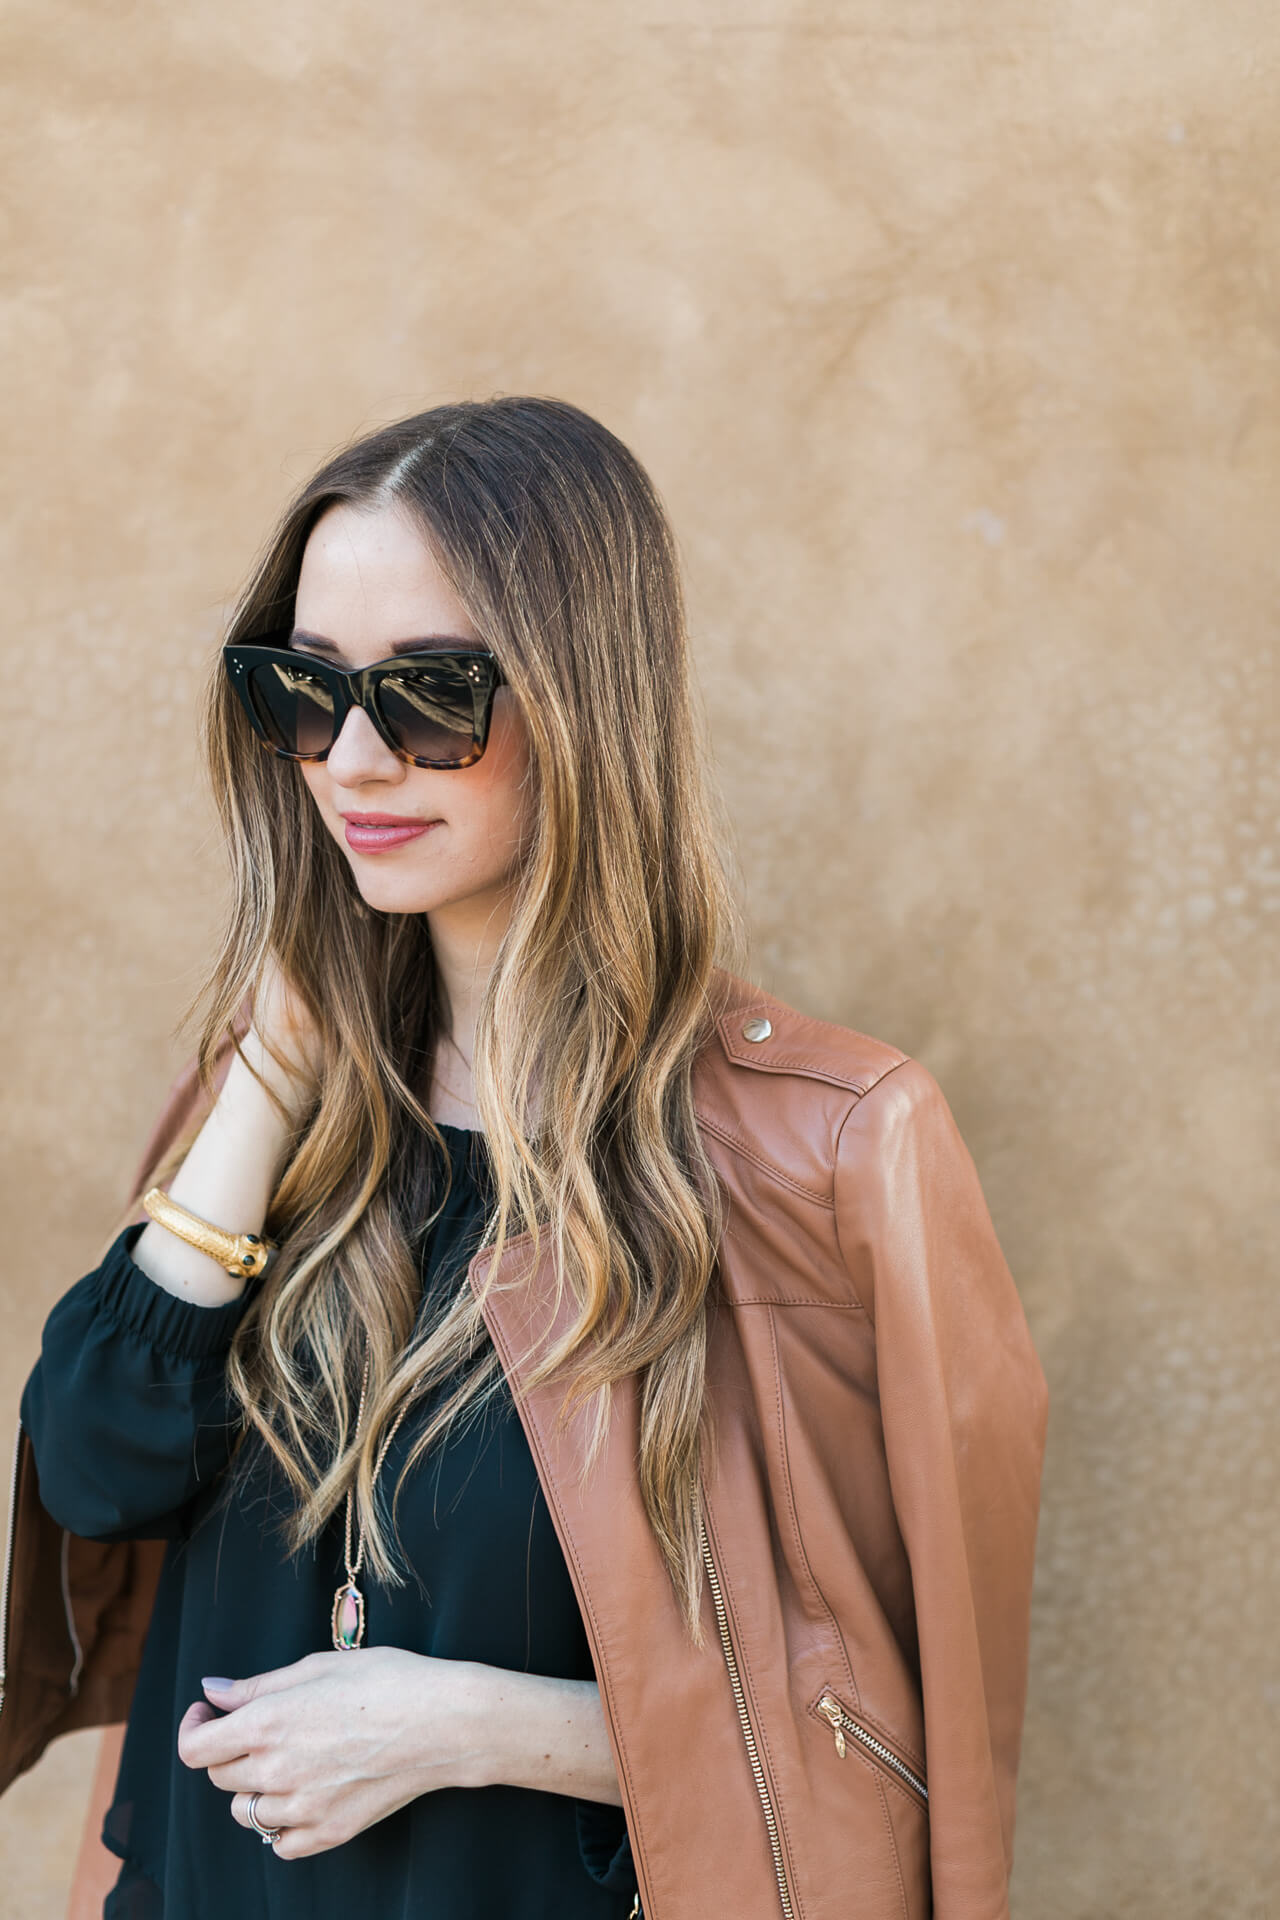 celine catherine sunglasses in black and tortoise